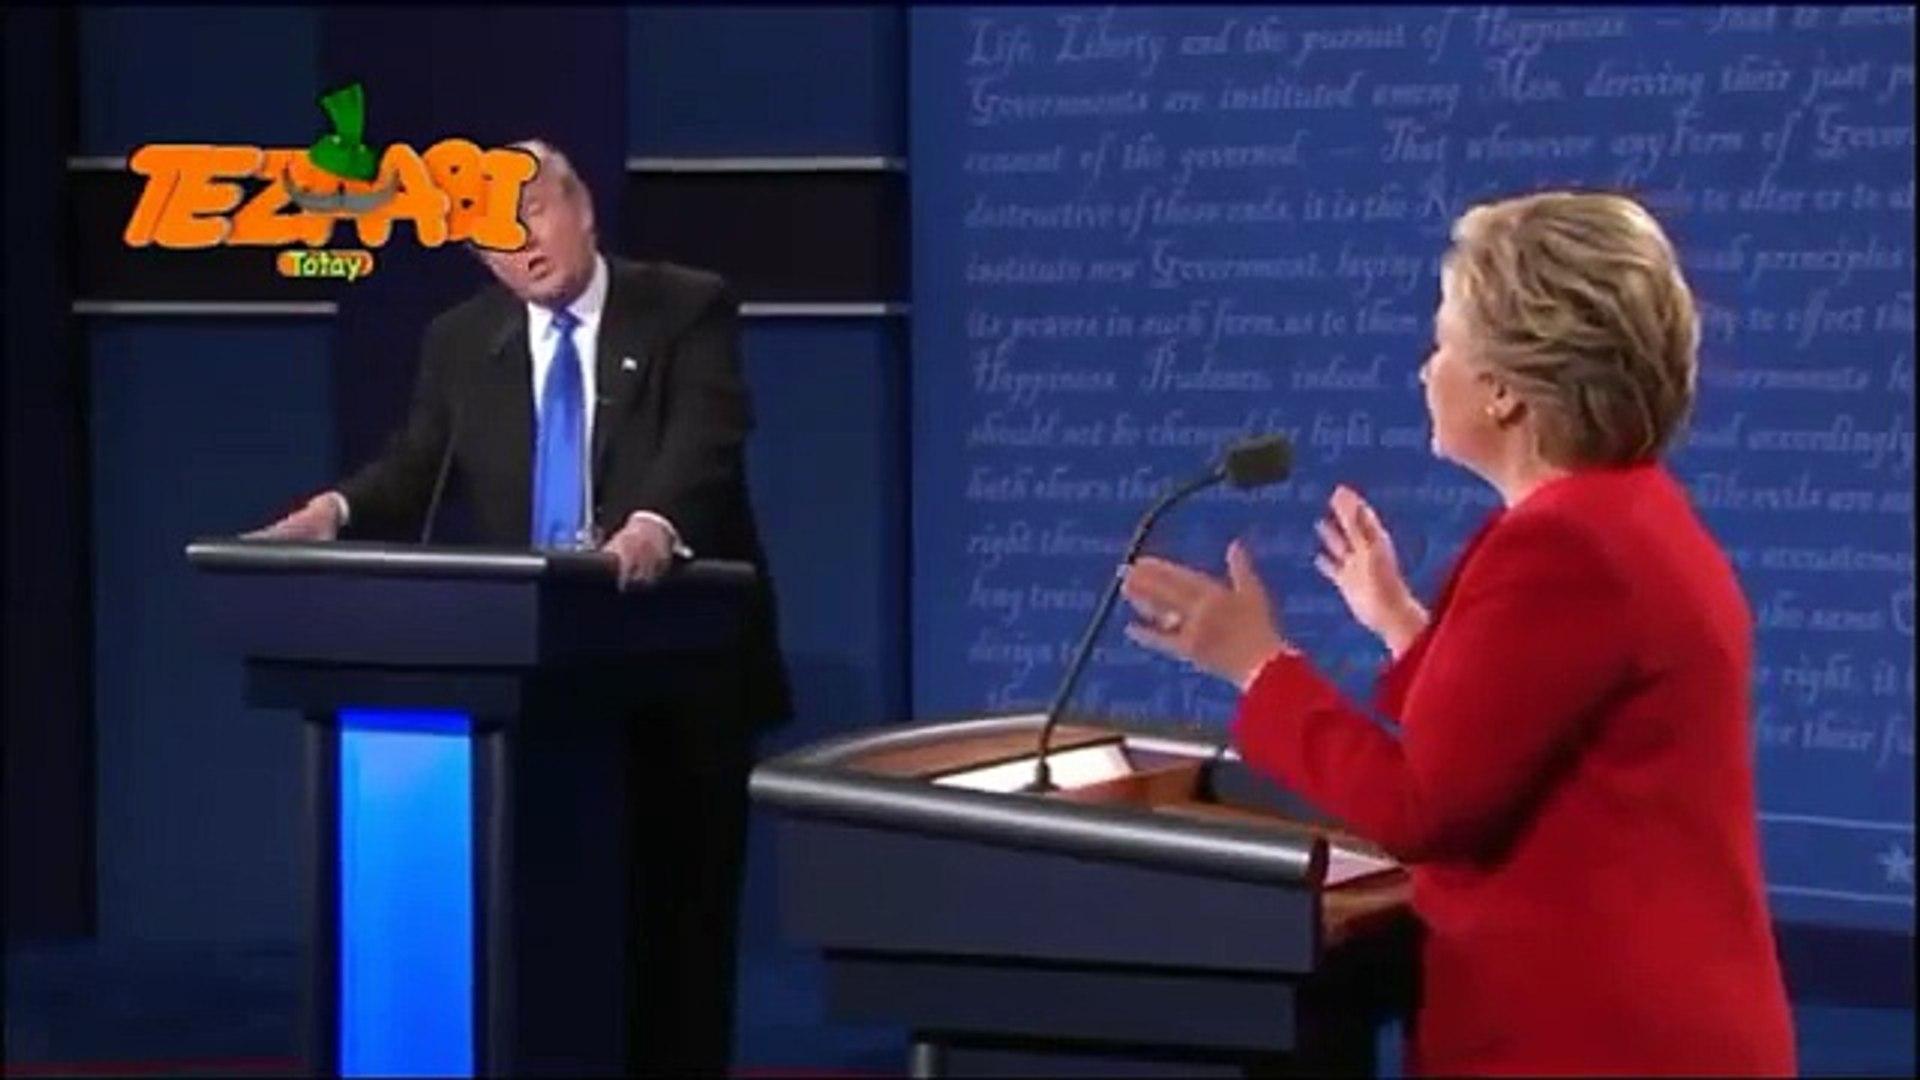 Donal Trump vs Hillary Clinton Tezabi Totay 2016 | America Election 2016 | Tezabi Totay 2016